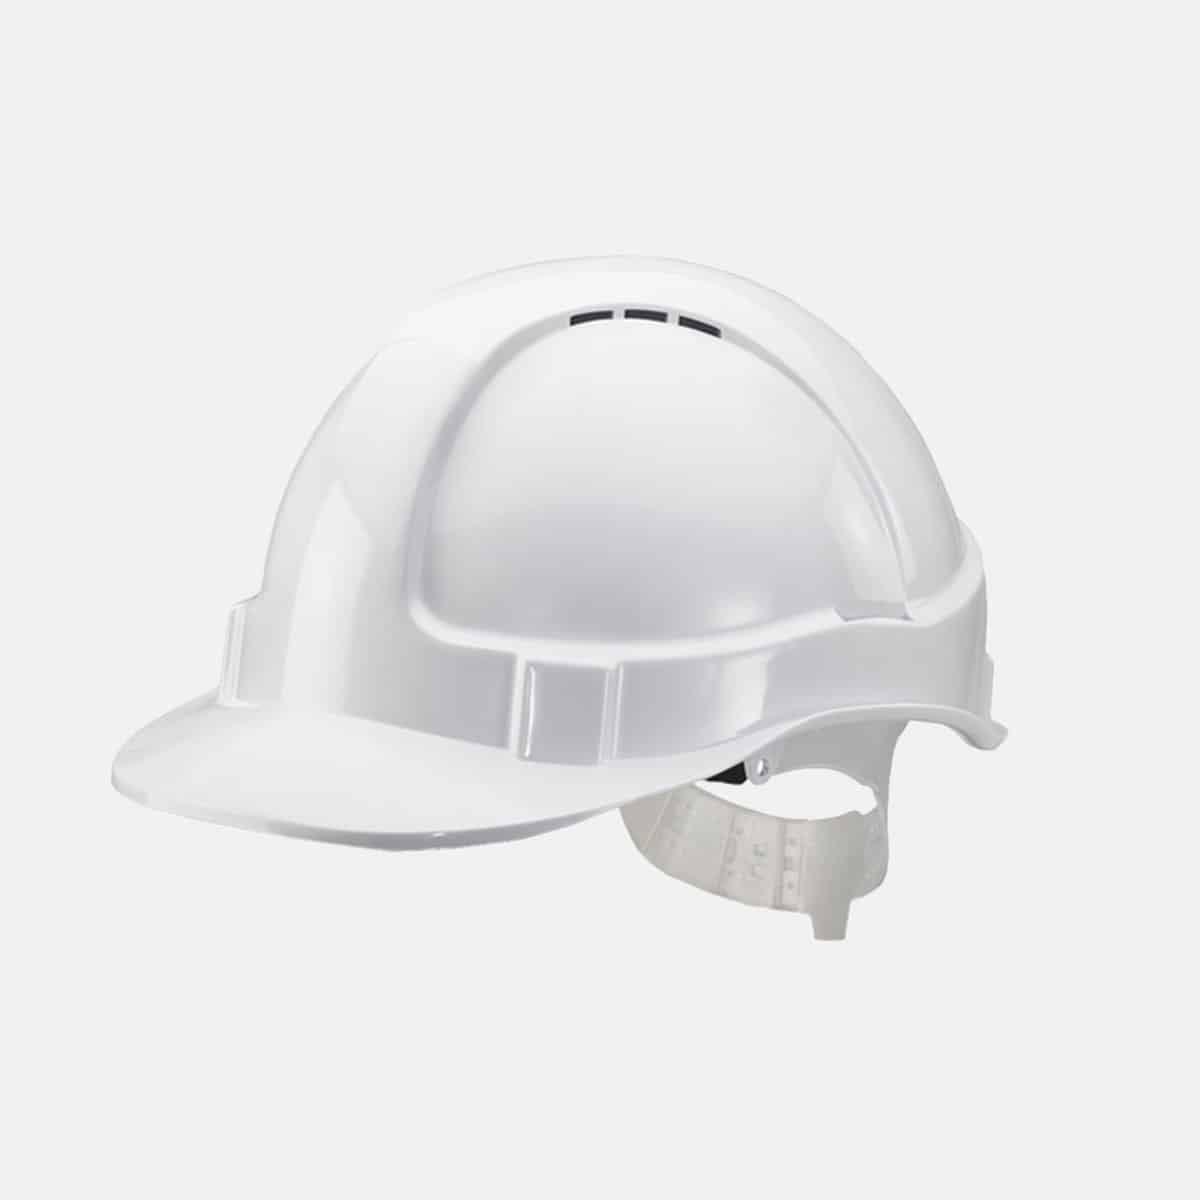 Bseen Economy Vented Safety Helmet